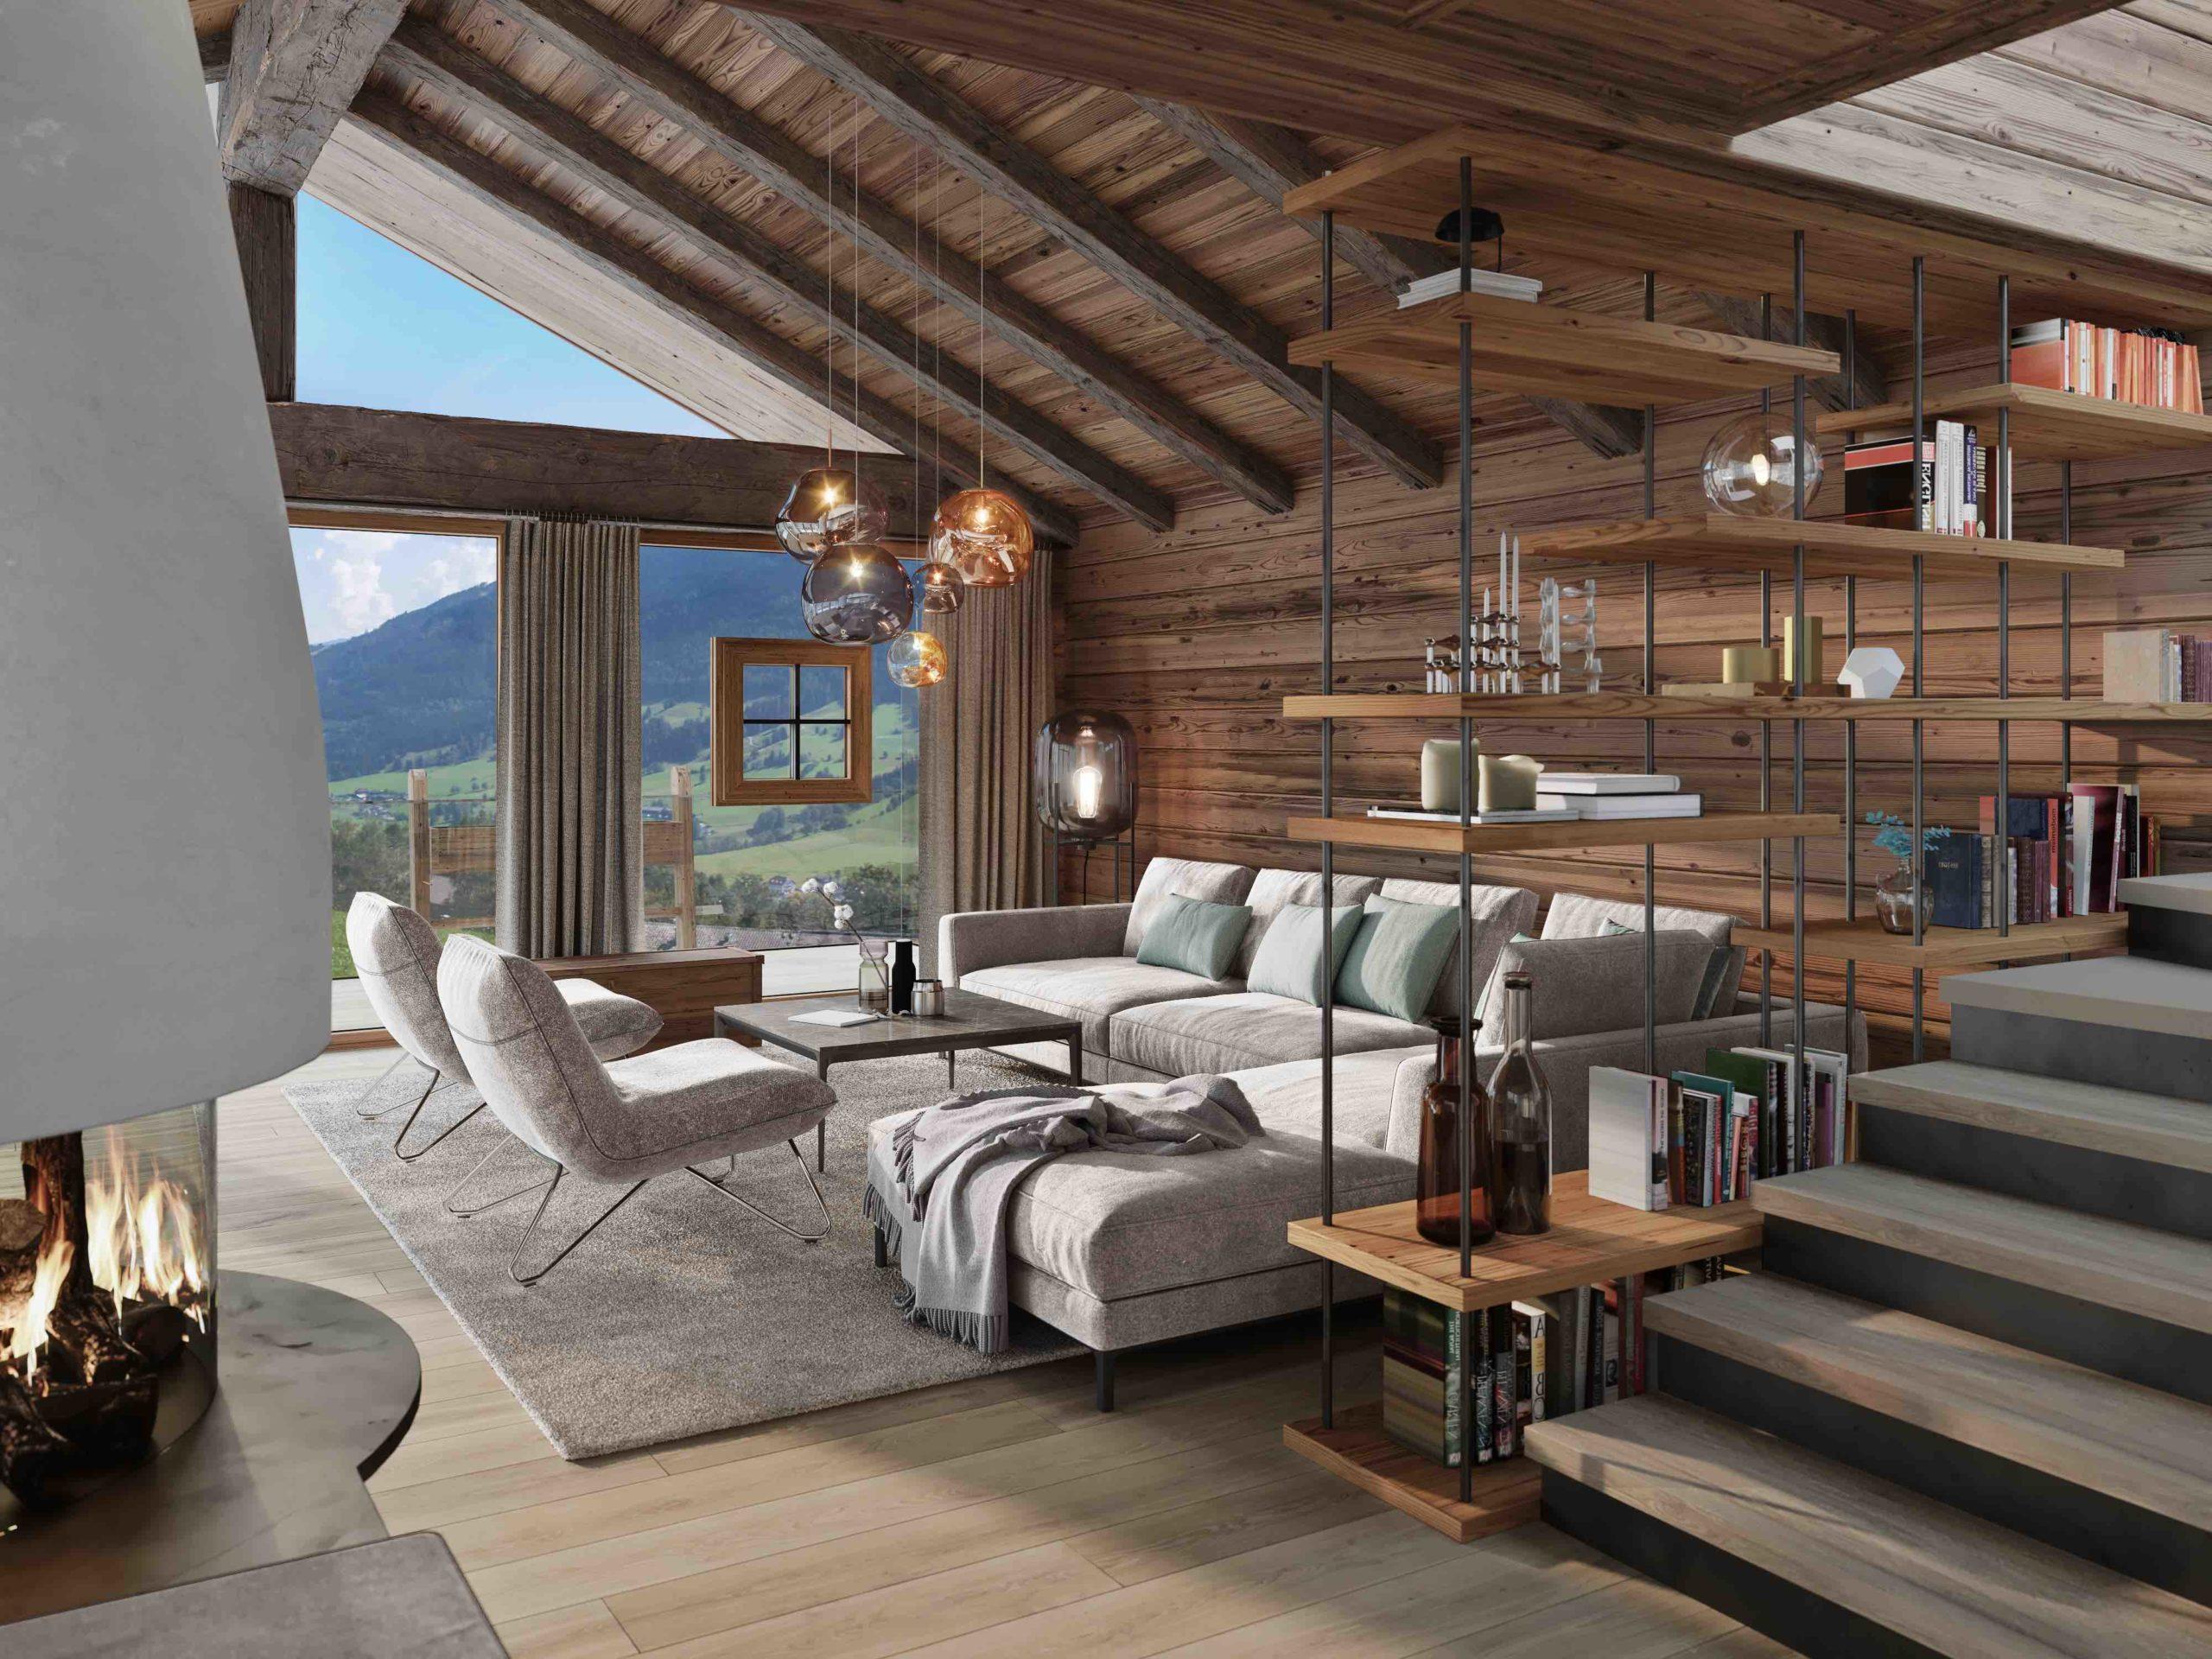 Senhoog Leogang Livingrooom Luxus Chalet Stil